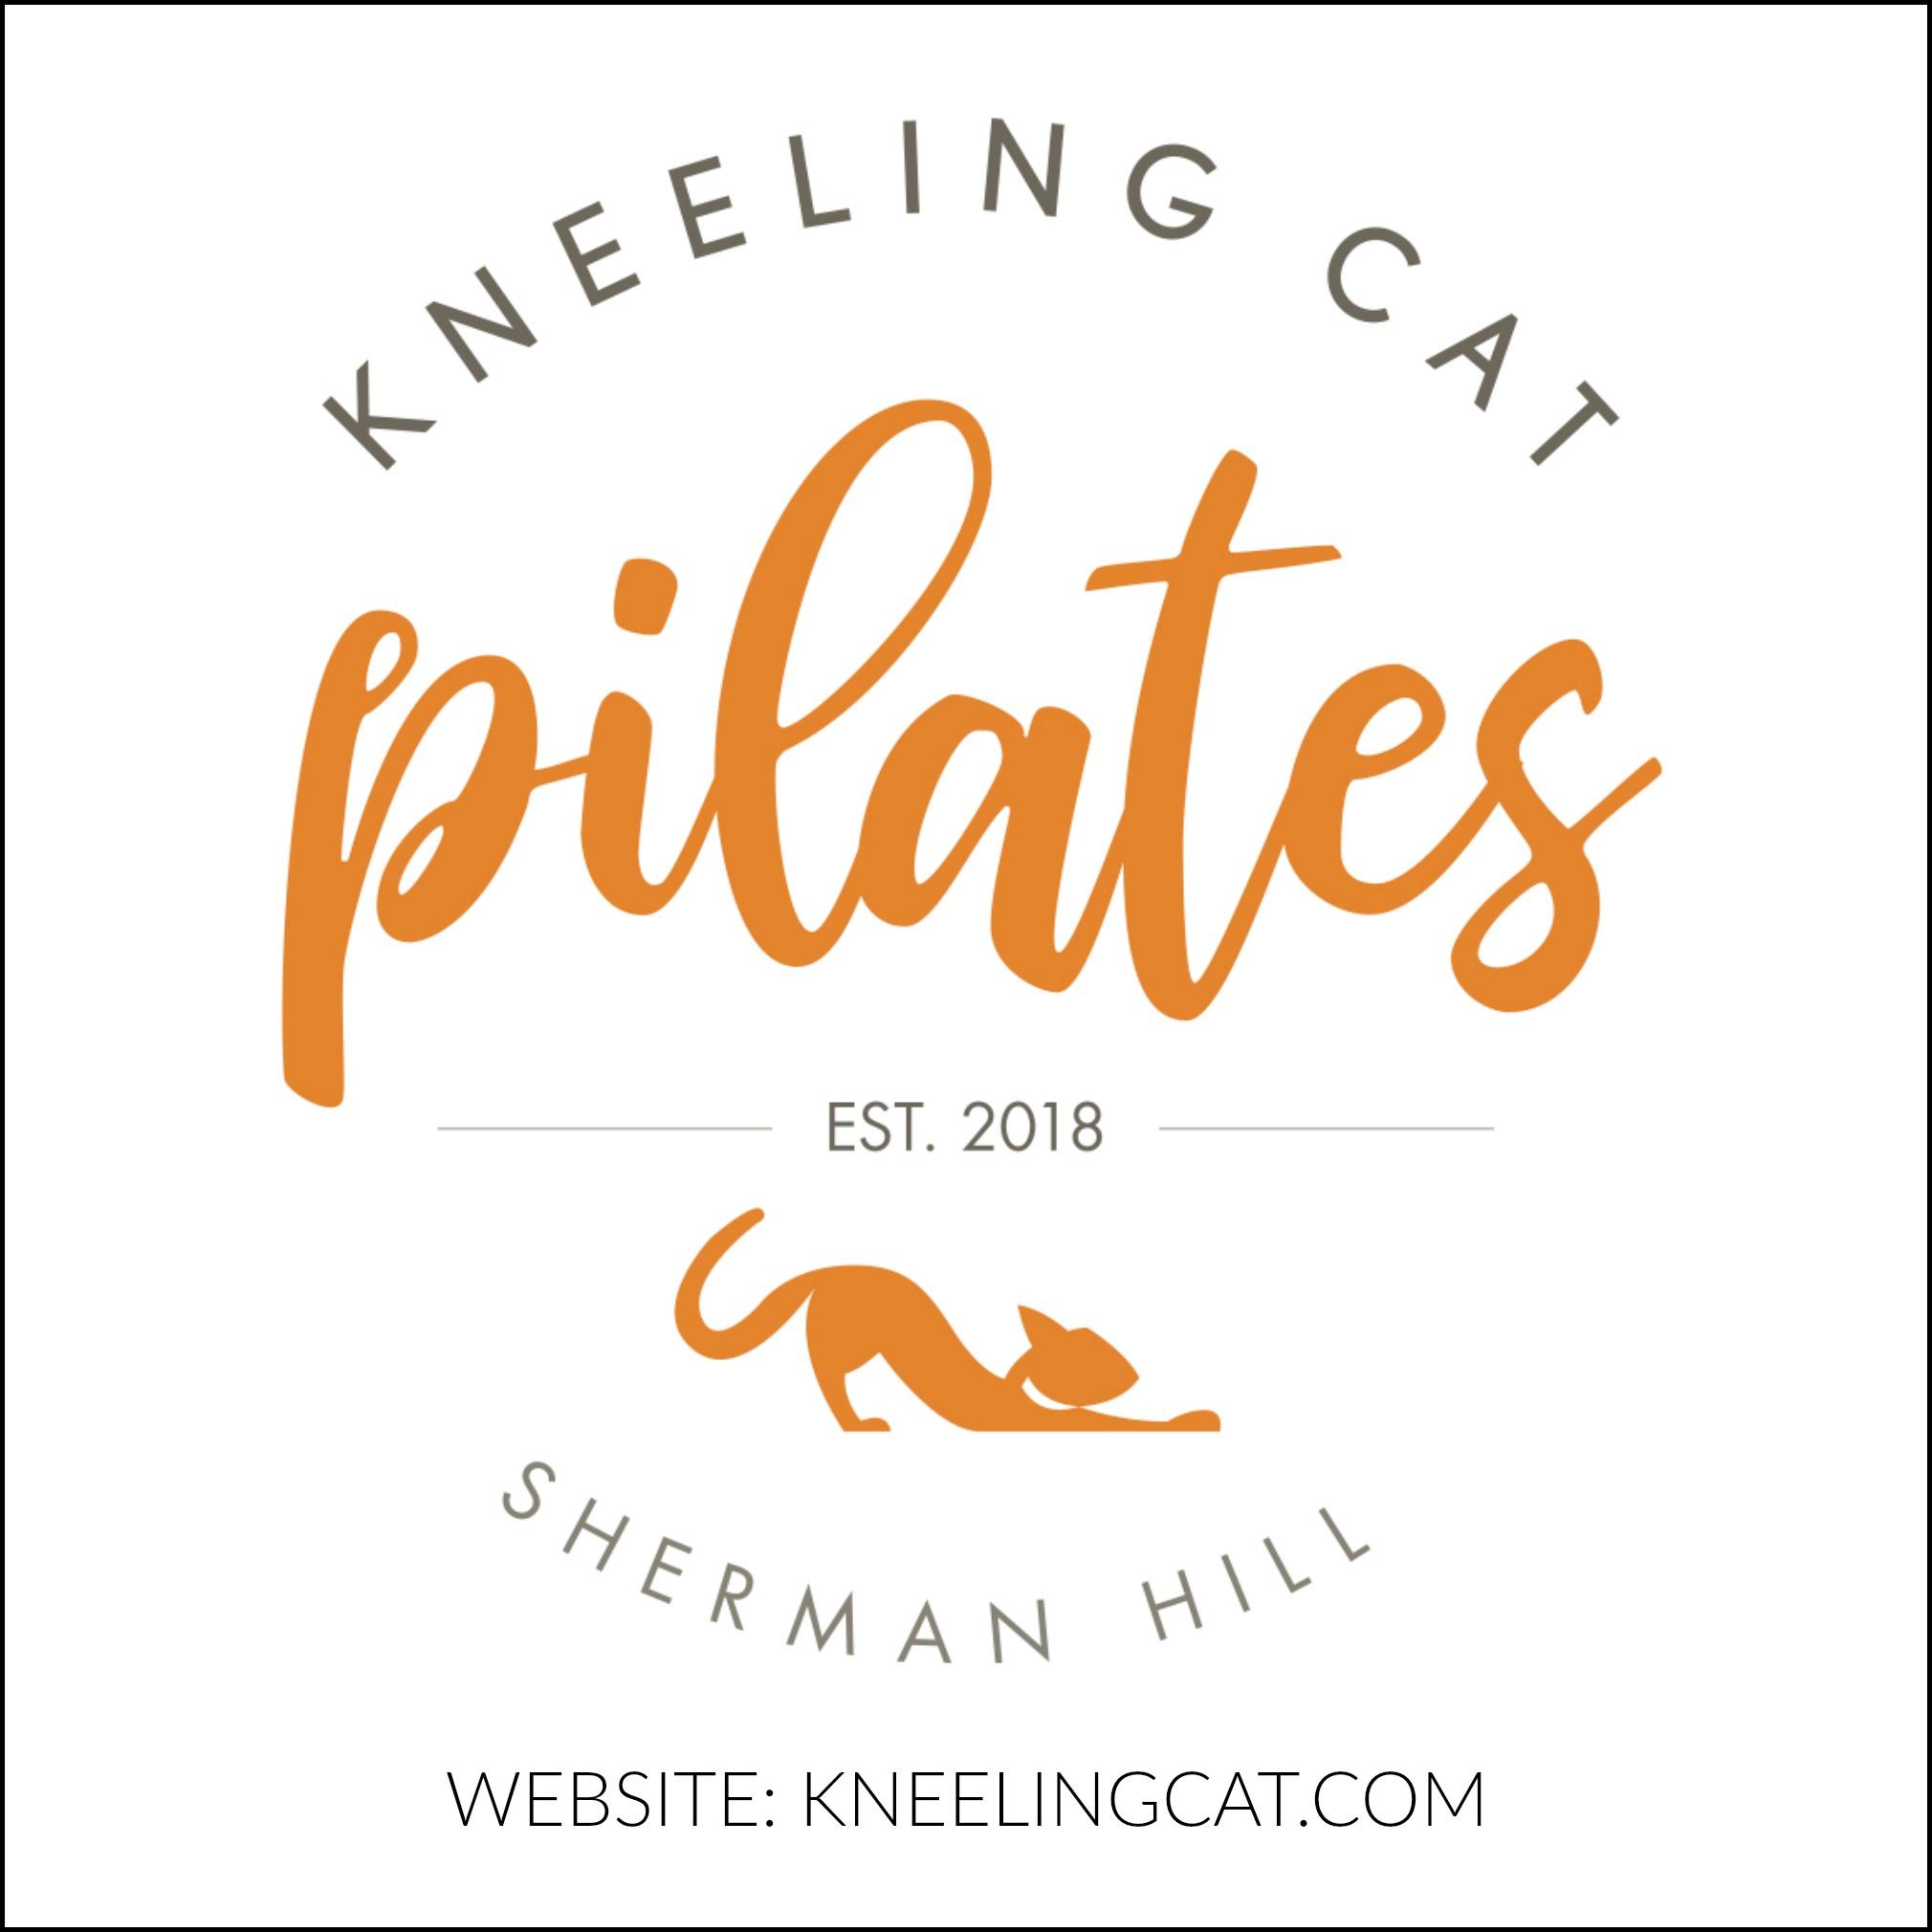 Kneeling Cat Pilates | KneelingCat.com